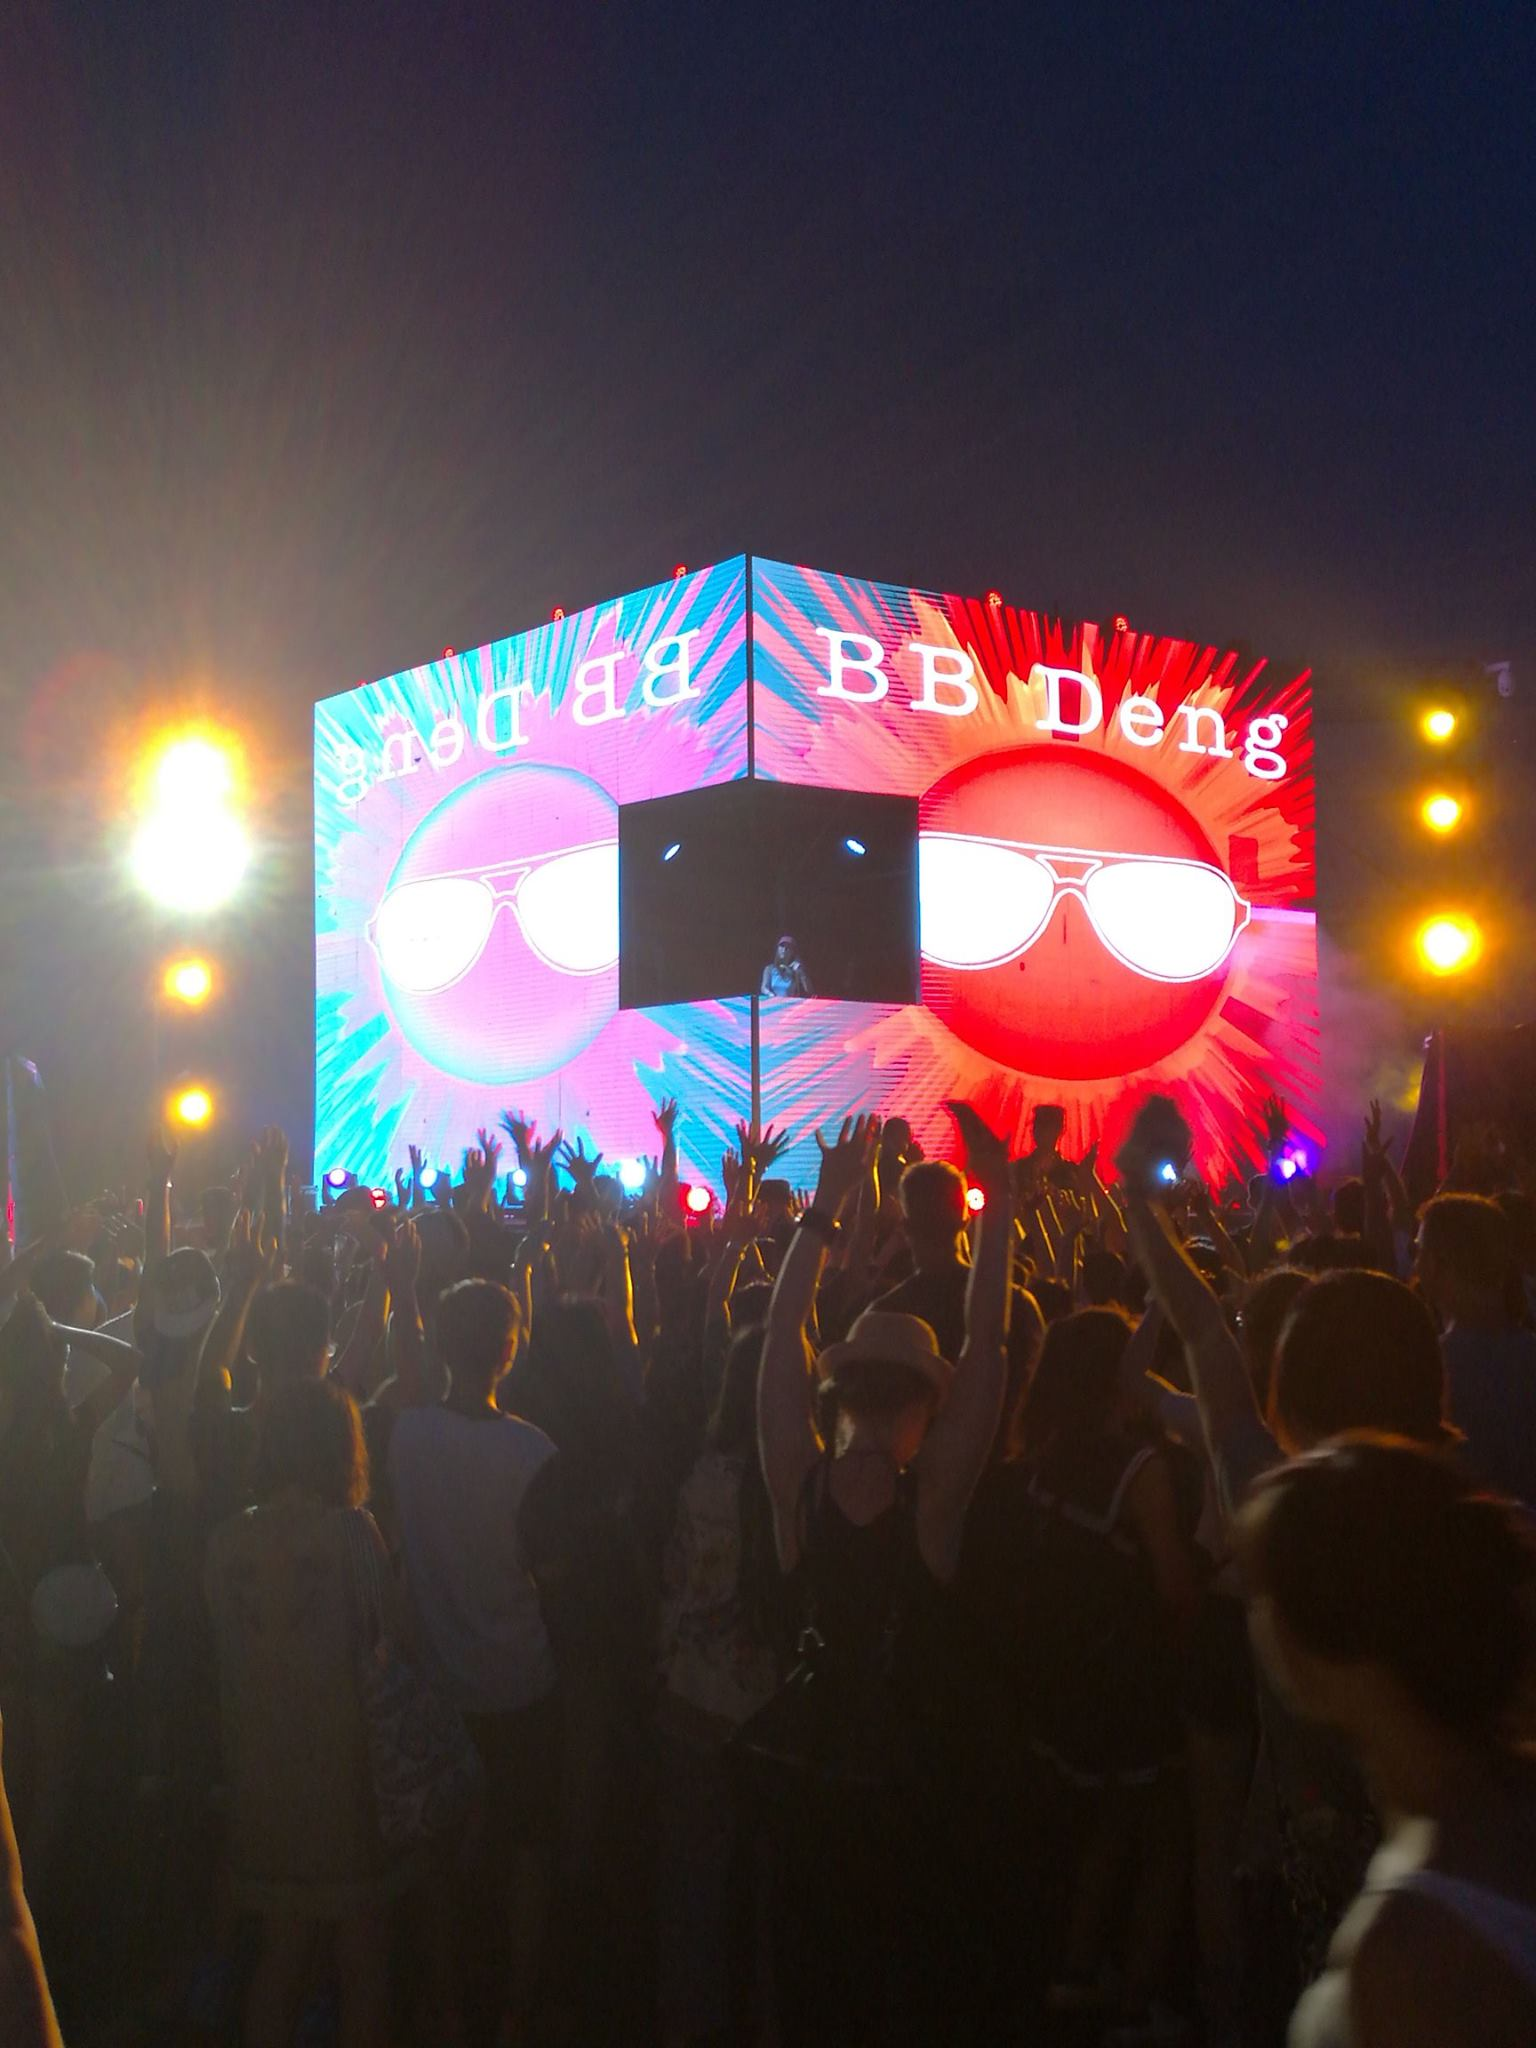 BB2016成都草莓音乐节